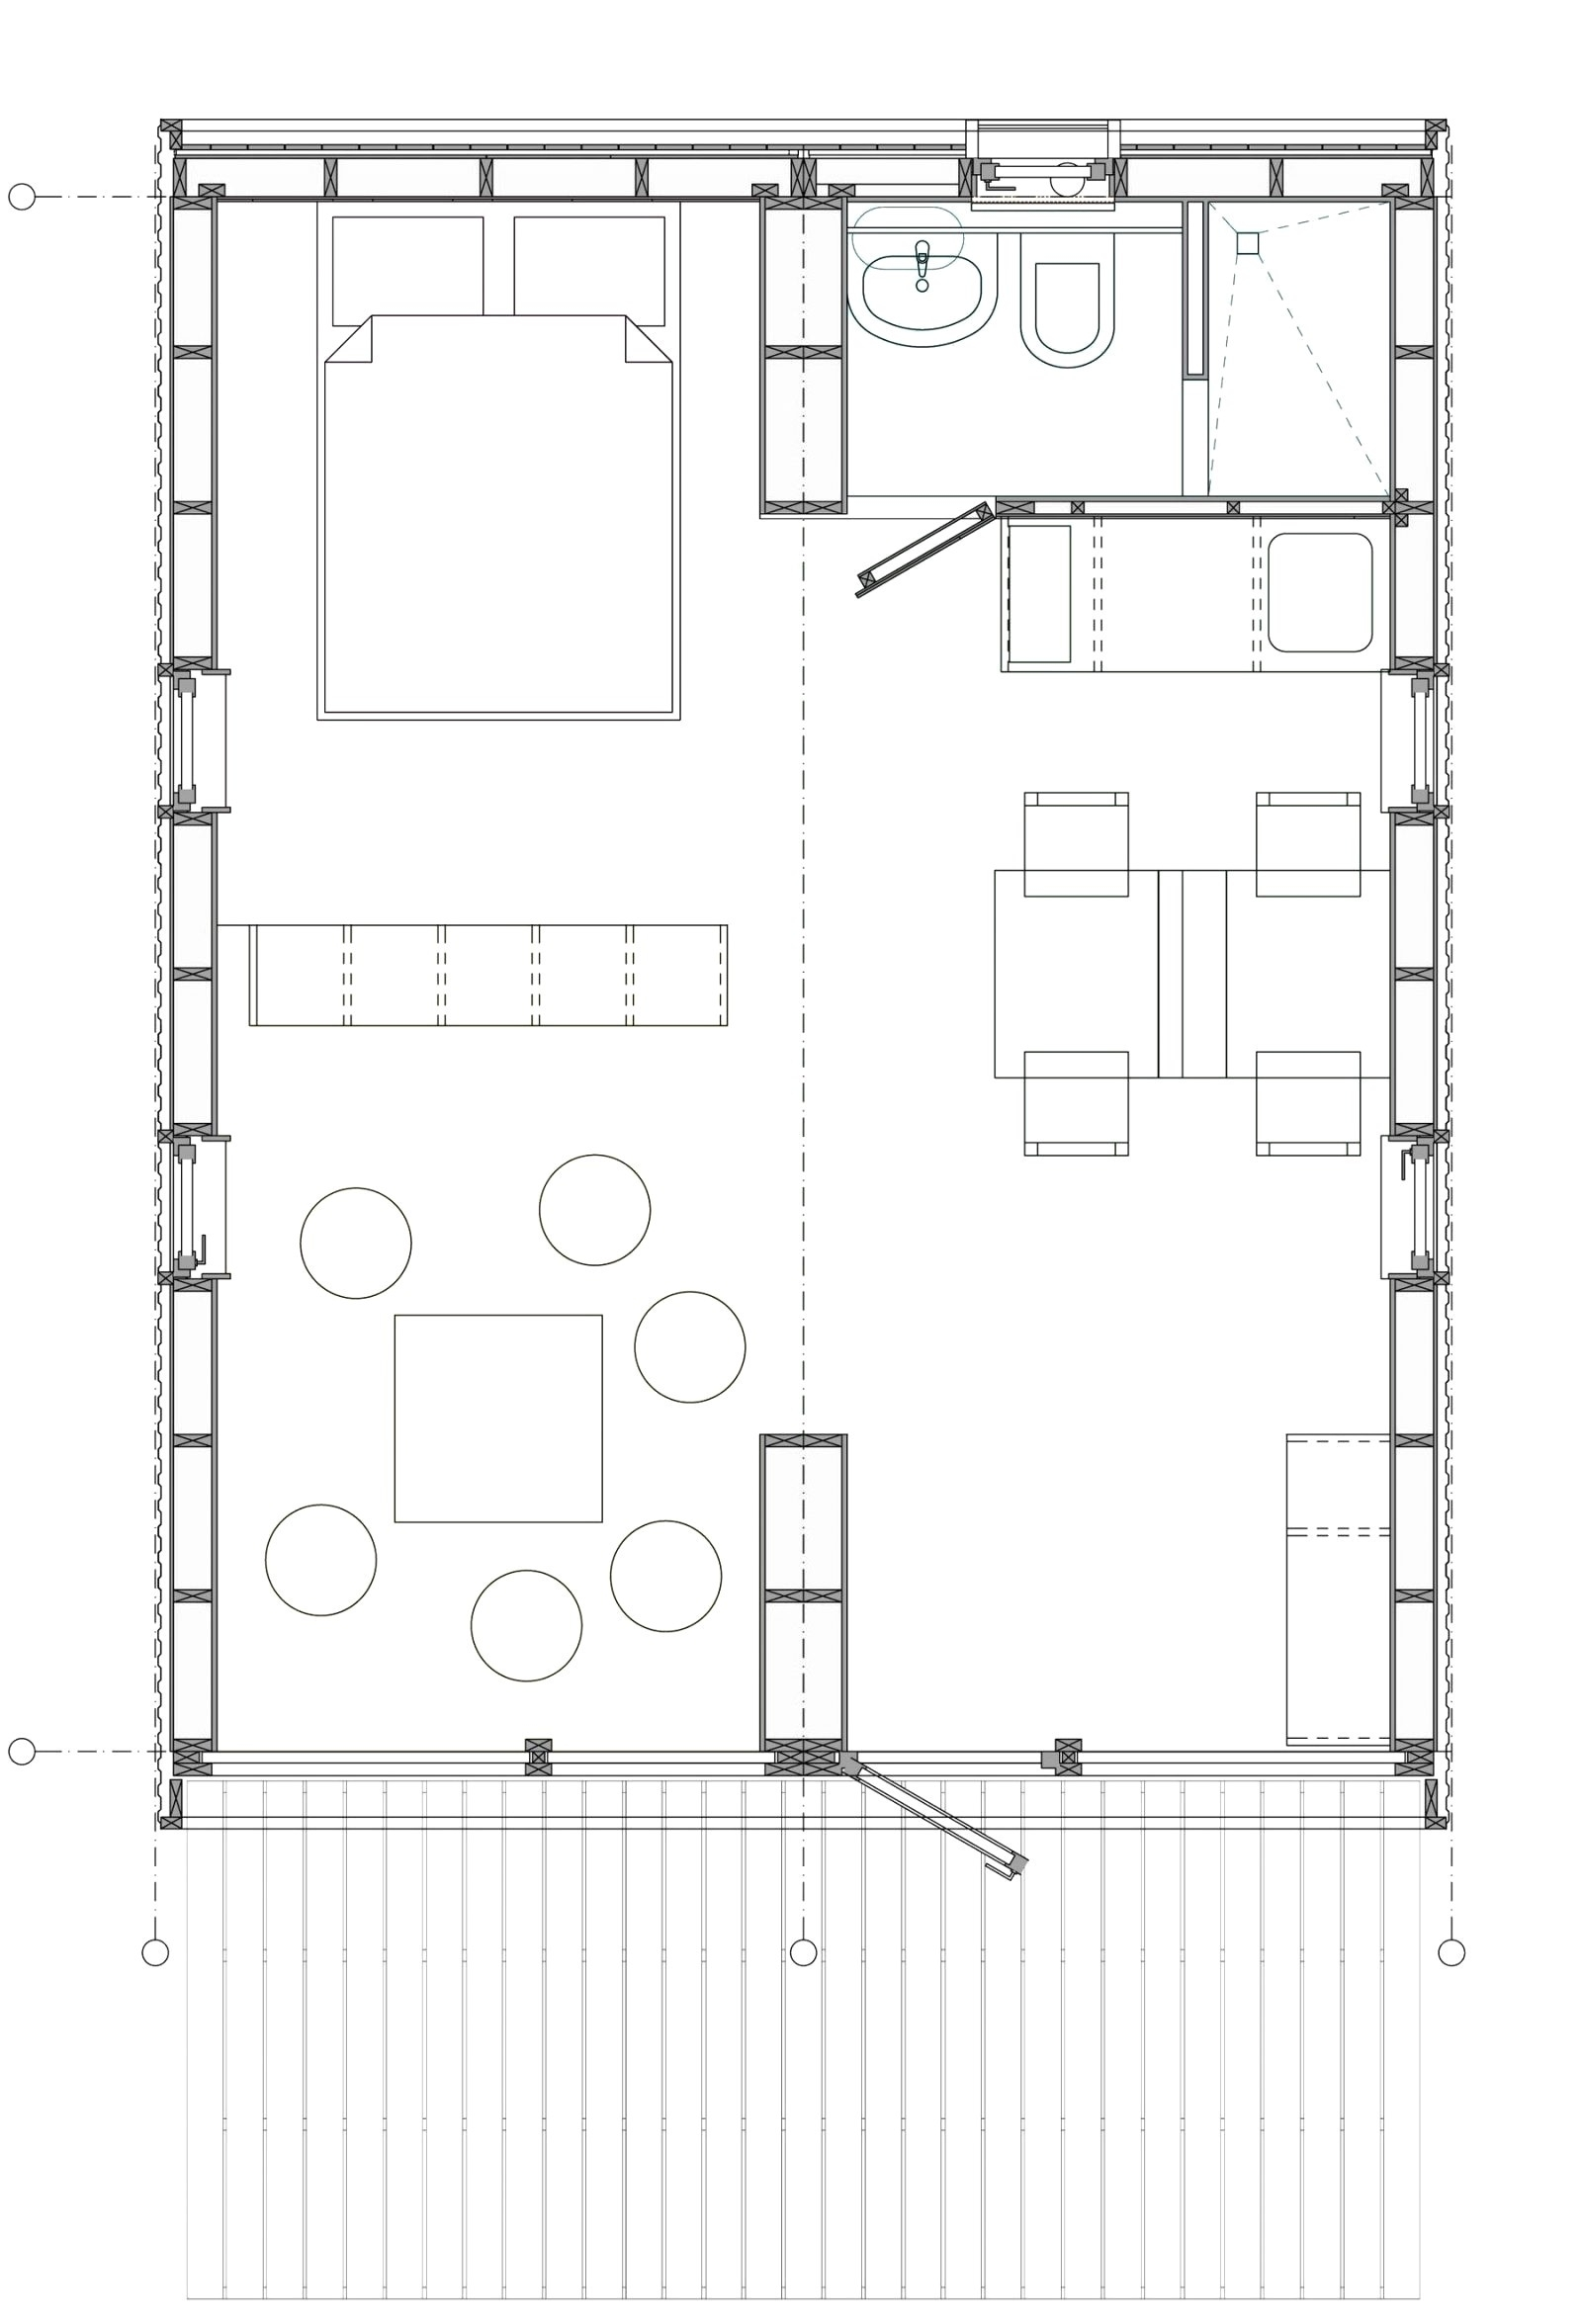 homes of merit floor plans best of homes merit mobile homes floor plans inspirational homes merit